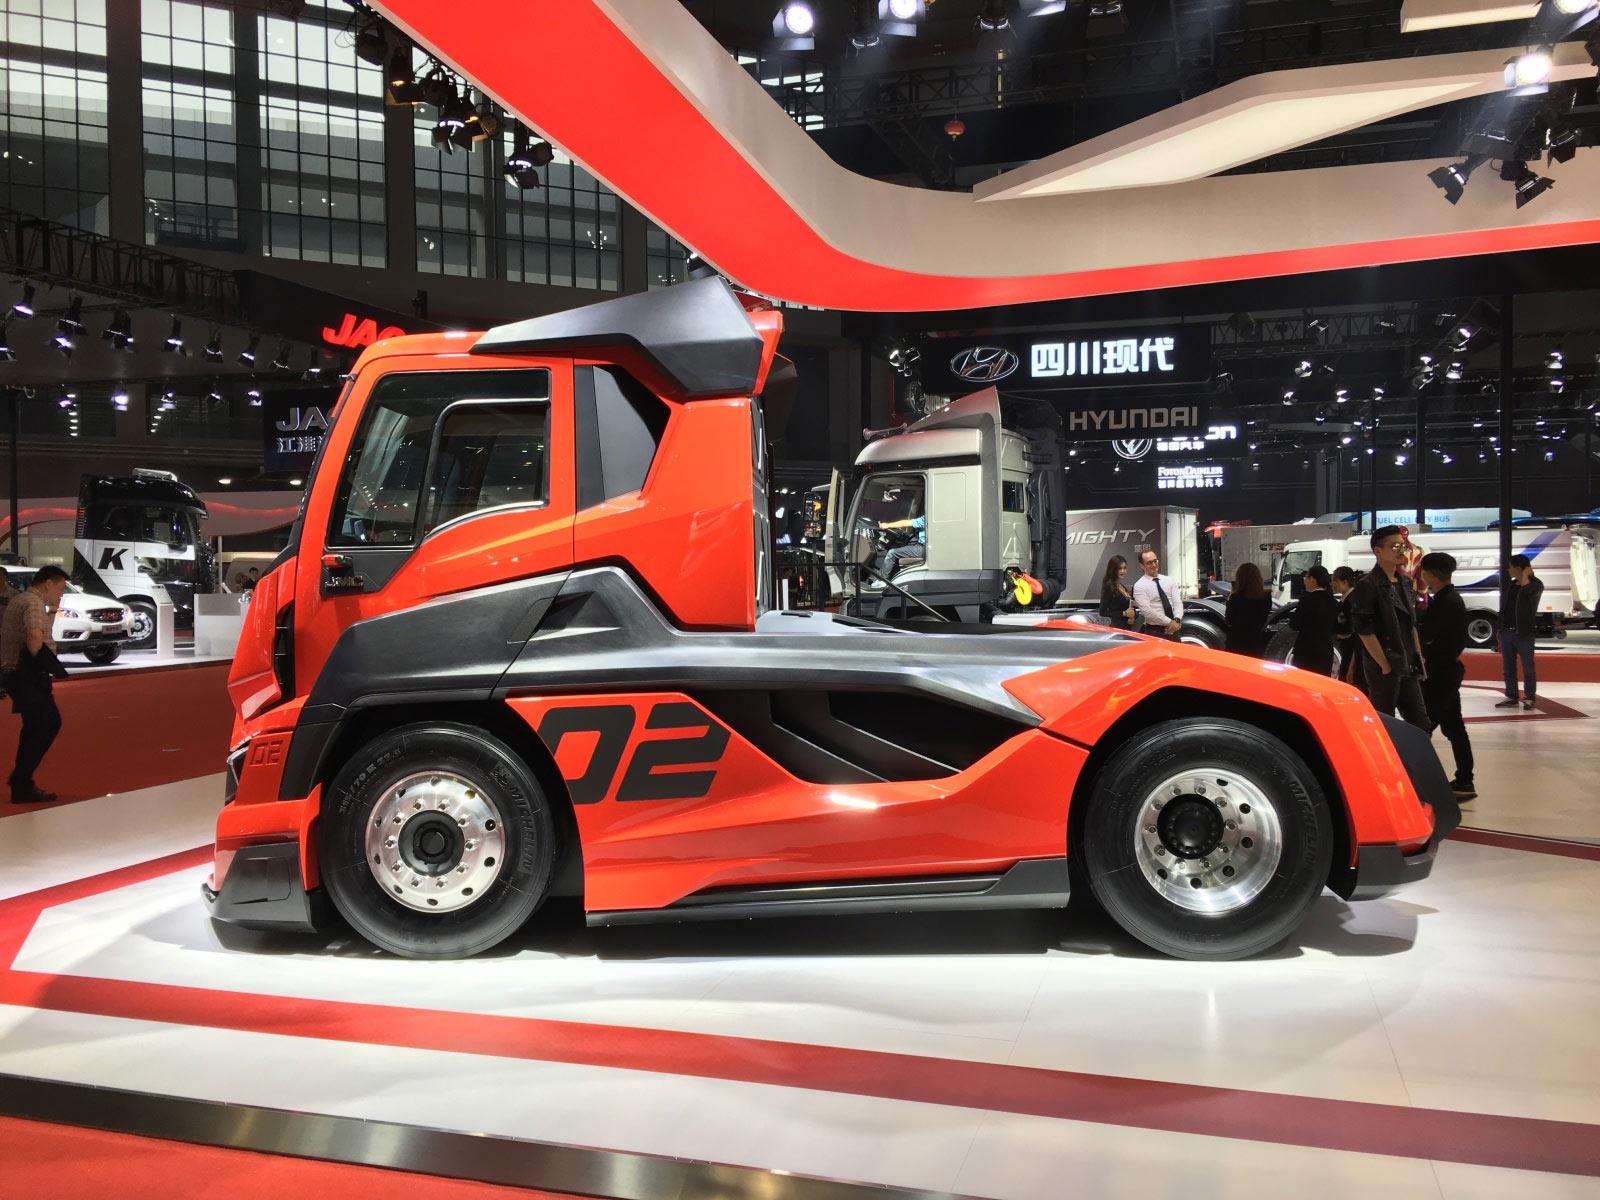 Alfa Romeo Usa >> JMC Race Truck Concept (Concept vehicles) - Trucksplanet